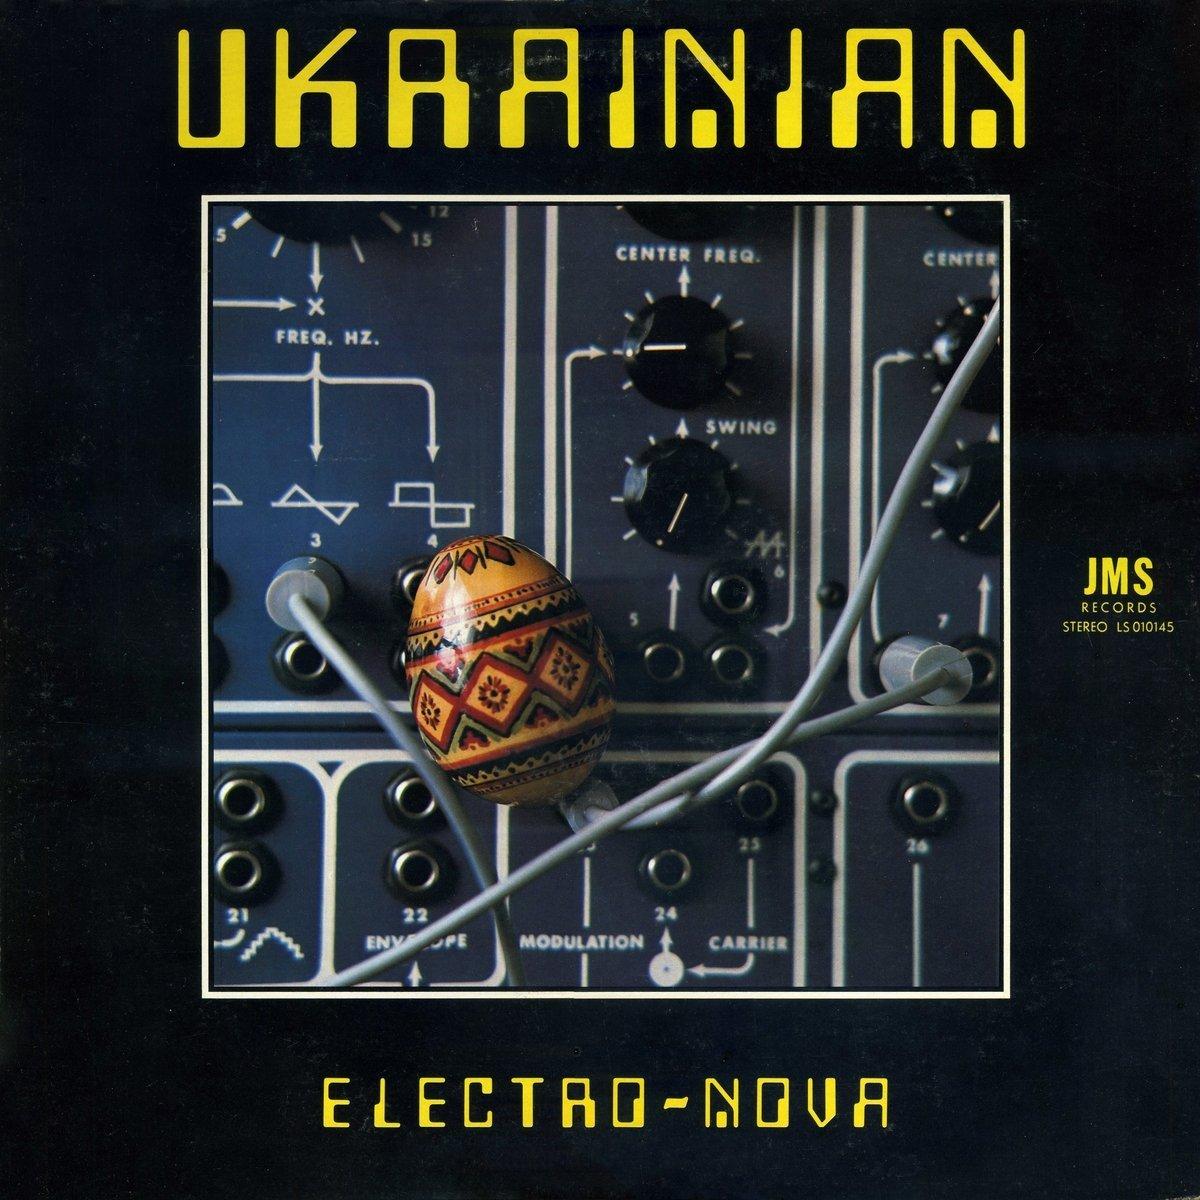 Electro-Nova – Ukrainian (JMS Records - LS 010145)